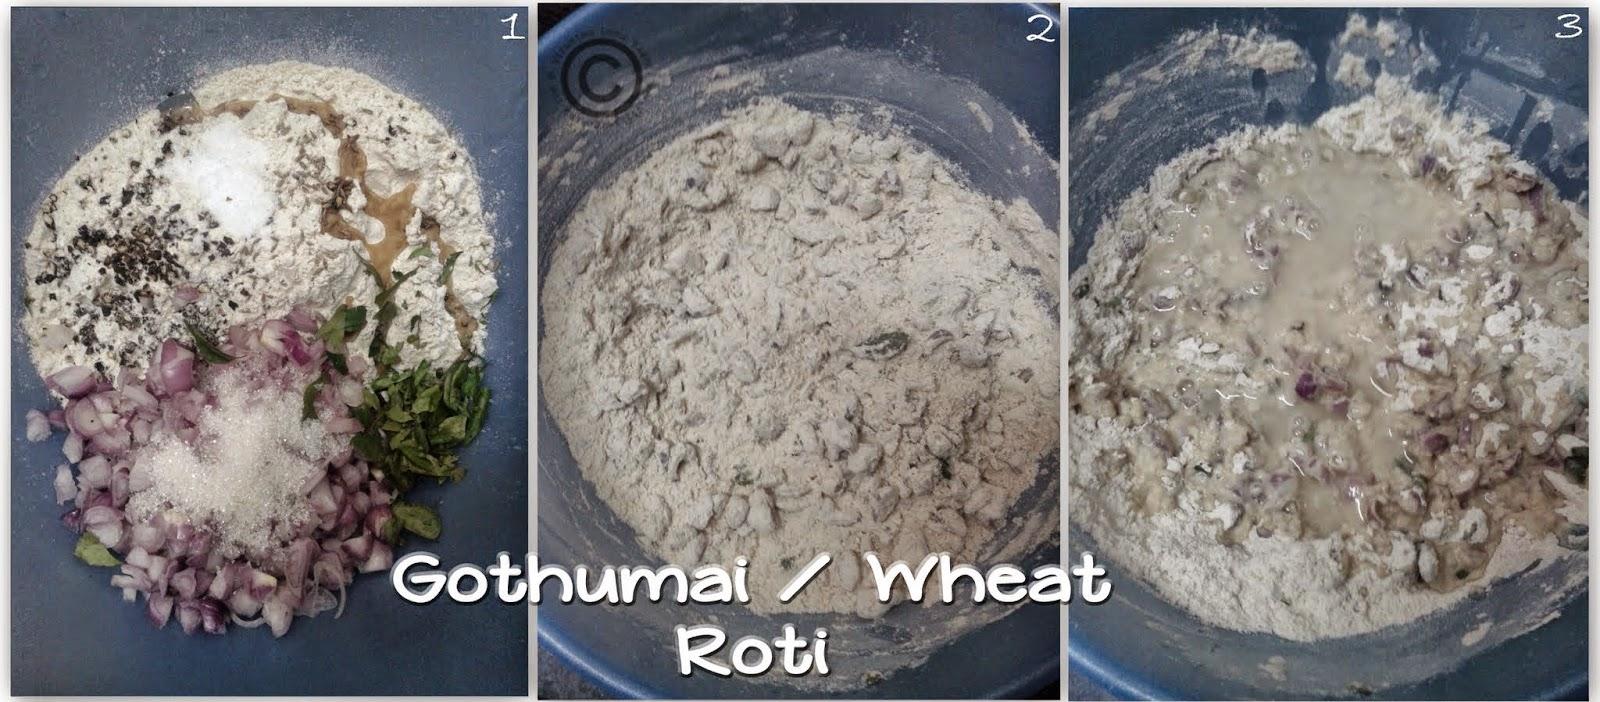 Wheat-roti